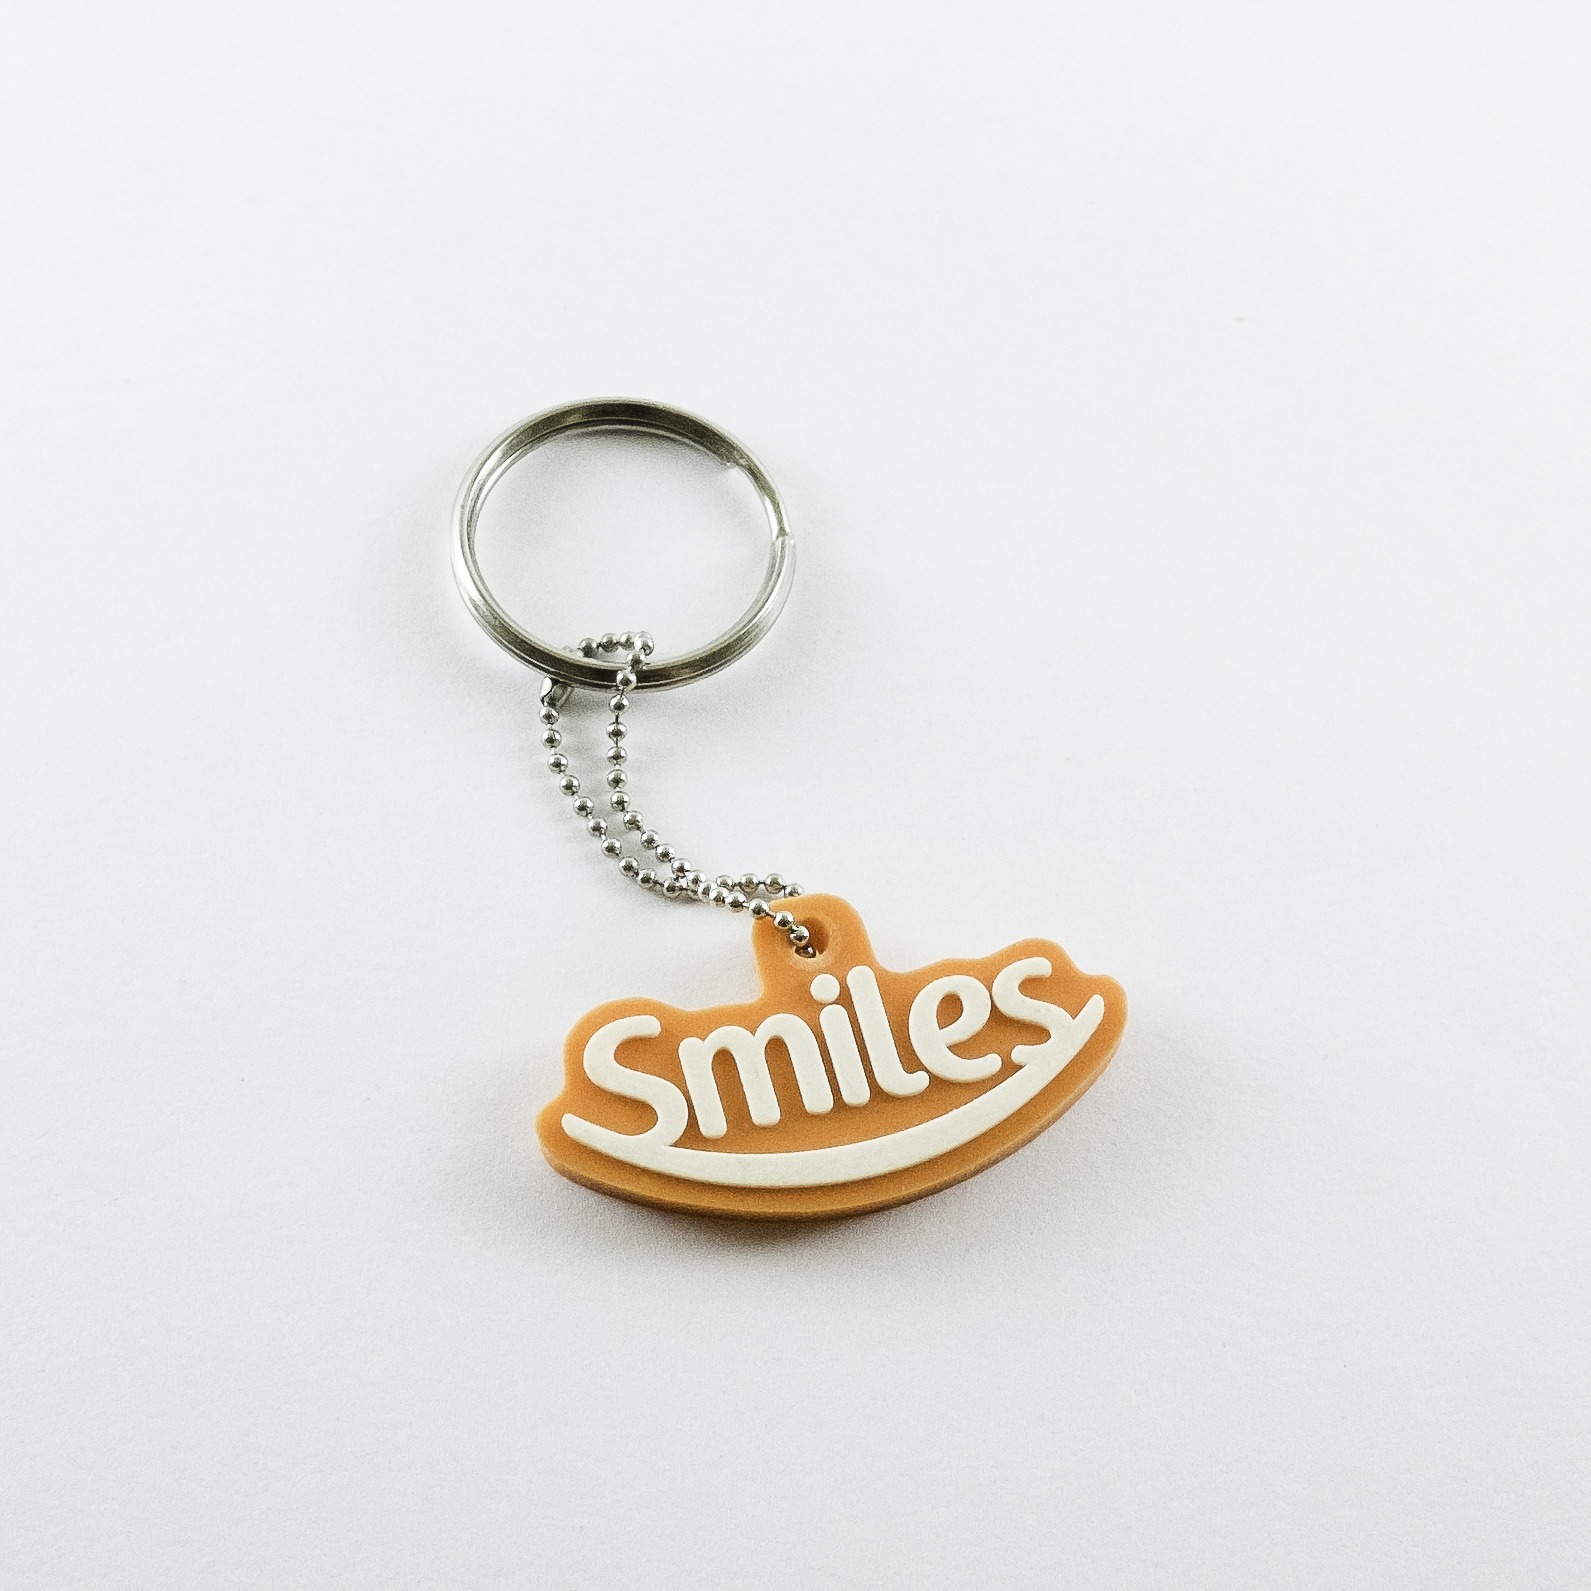 chaveiro emborrachado smiles relevo